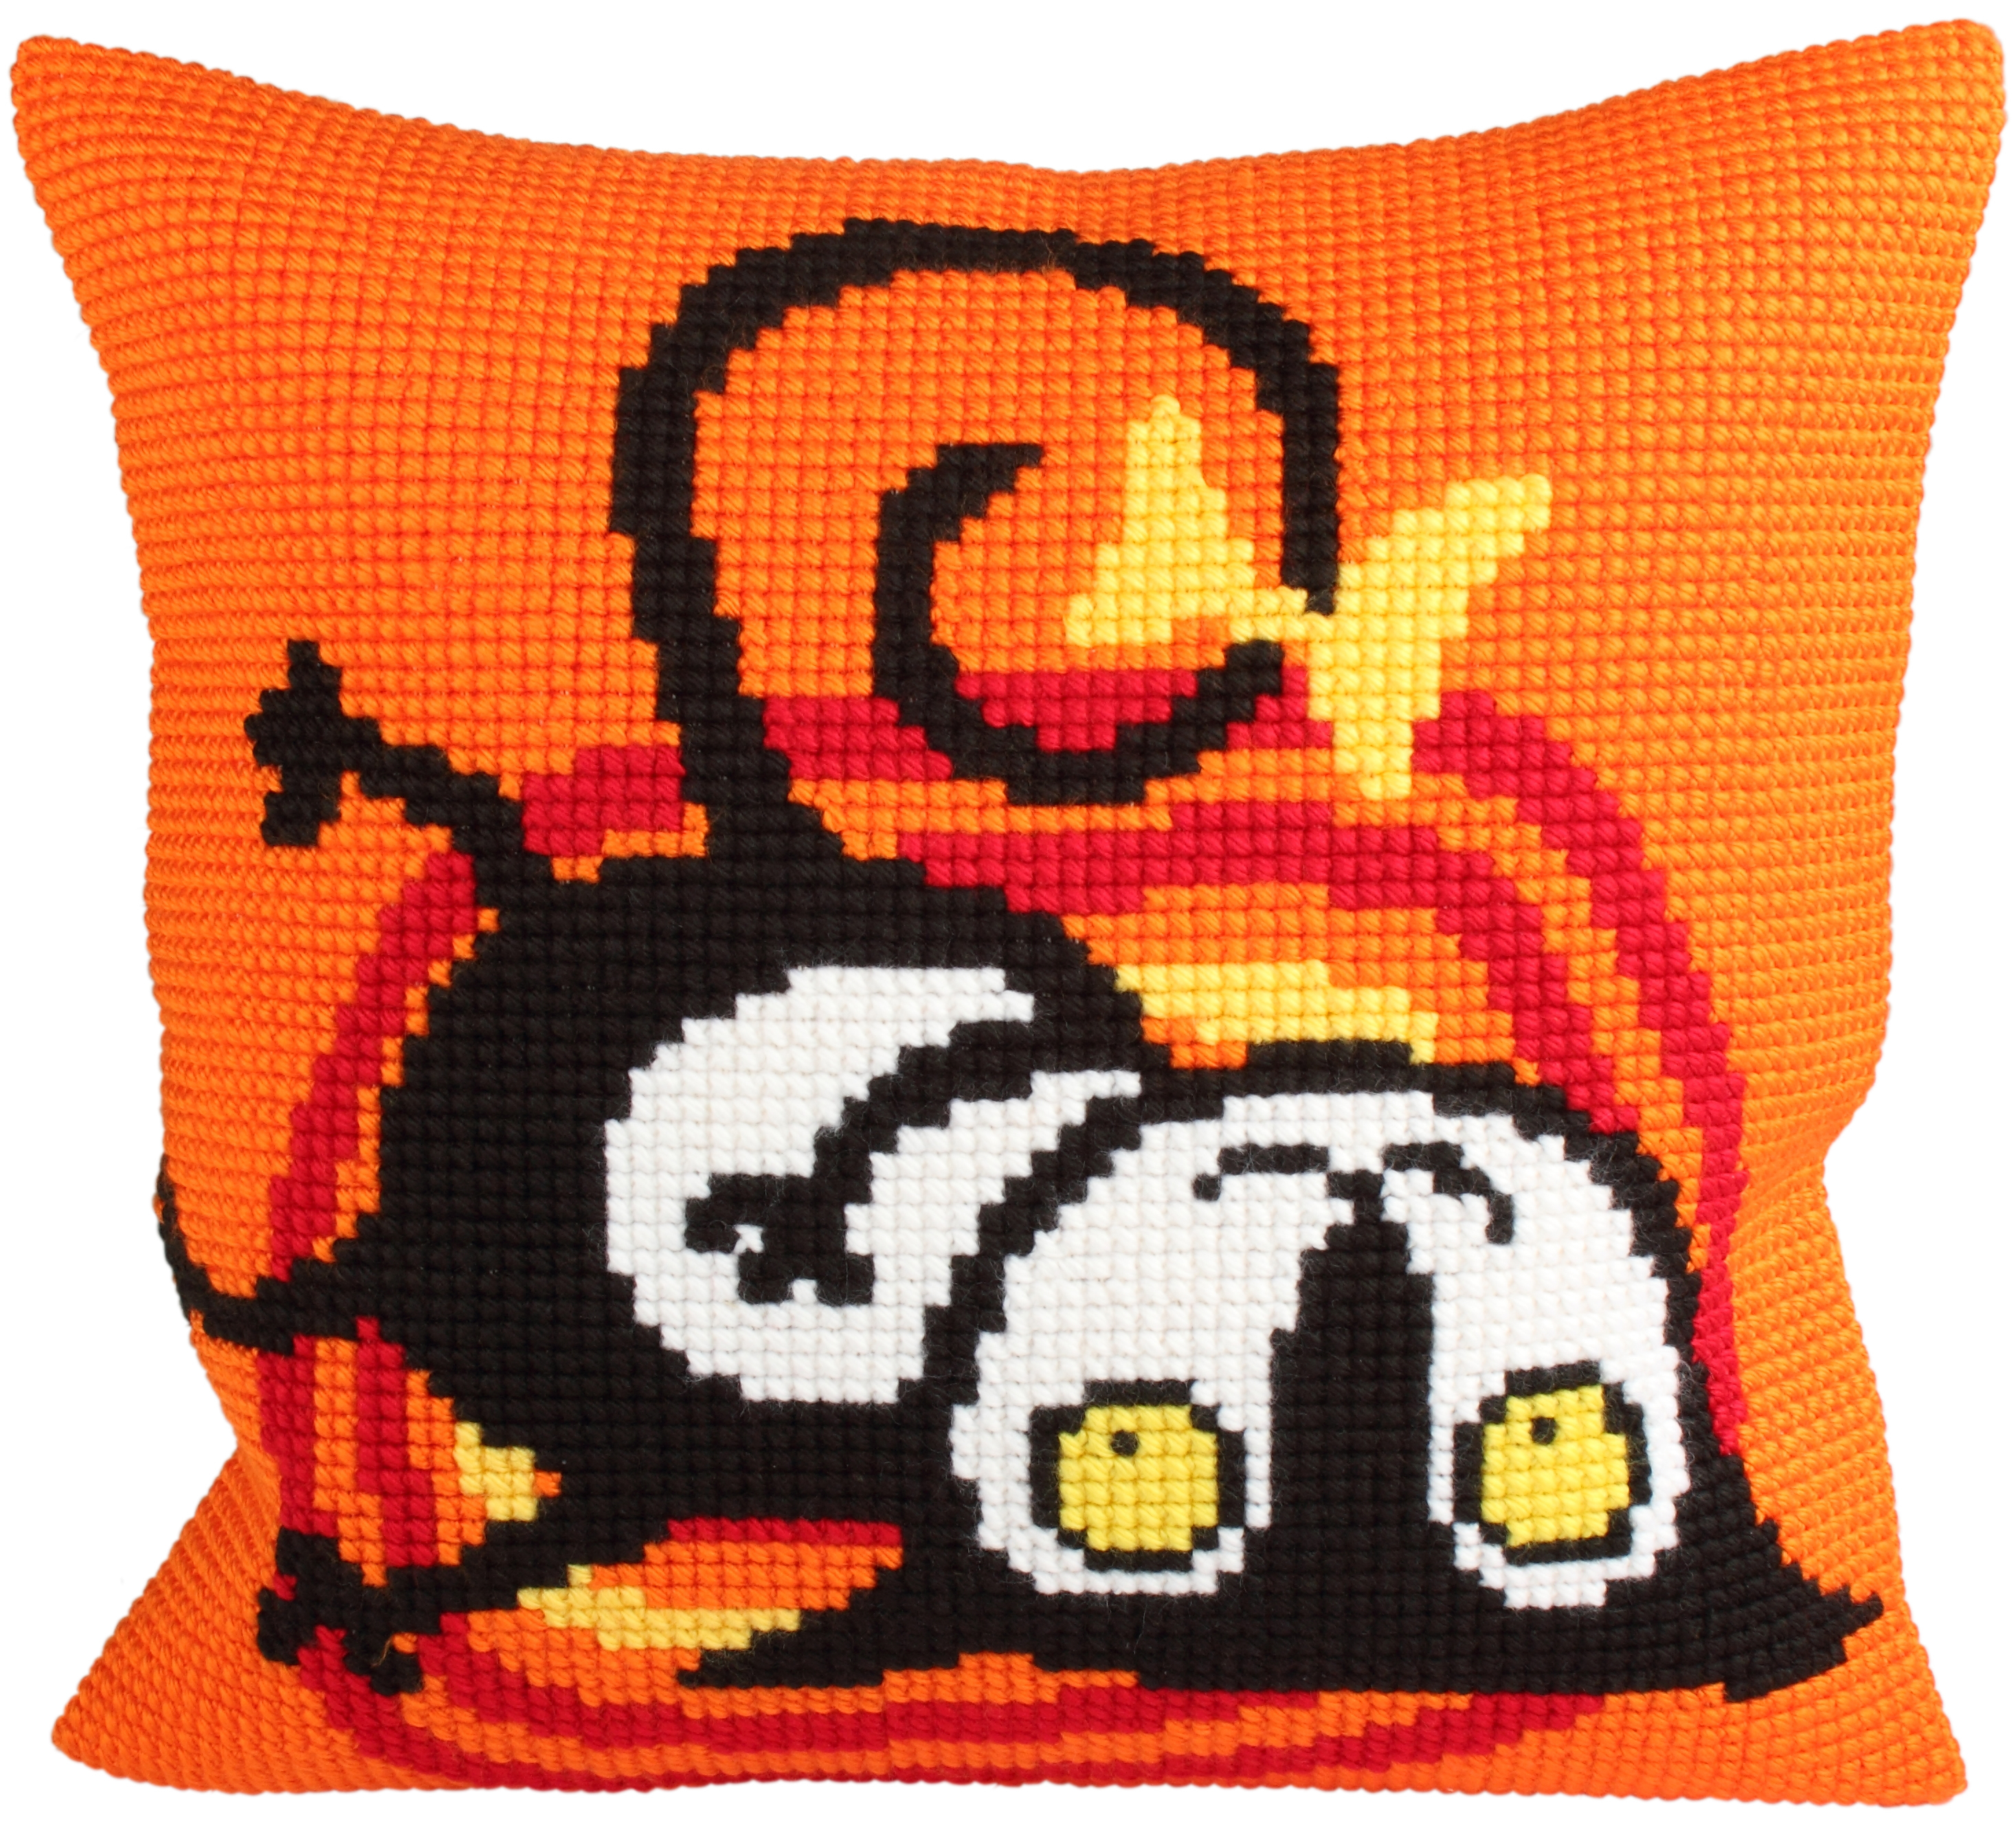 Cushion cross stitch kit Escaped Cat - Collection d'Art